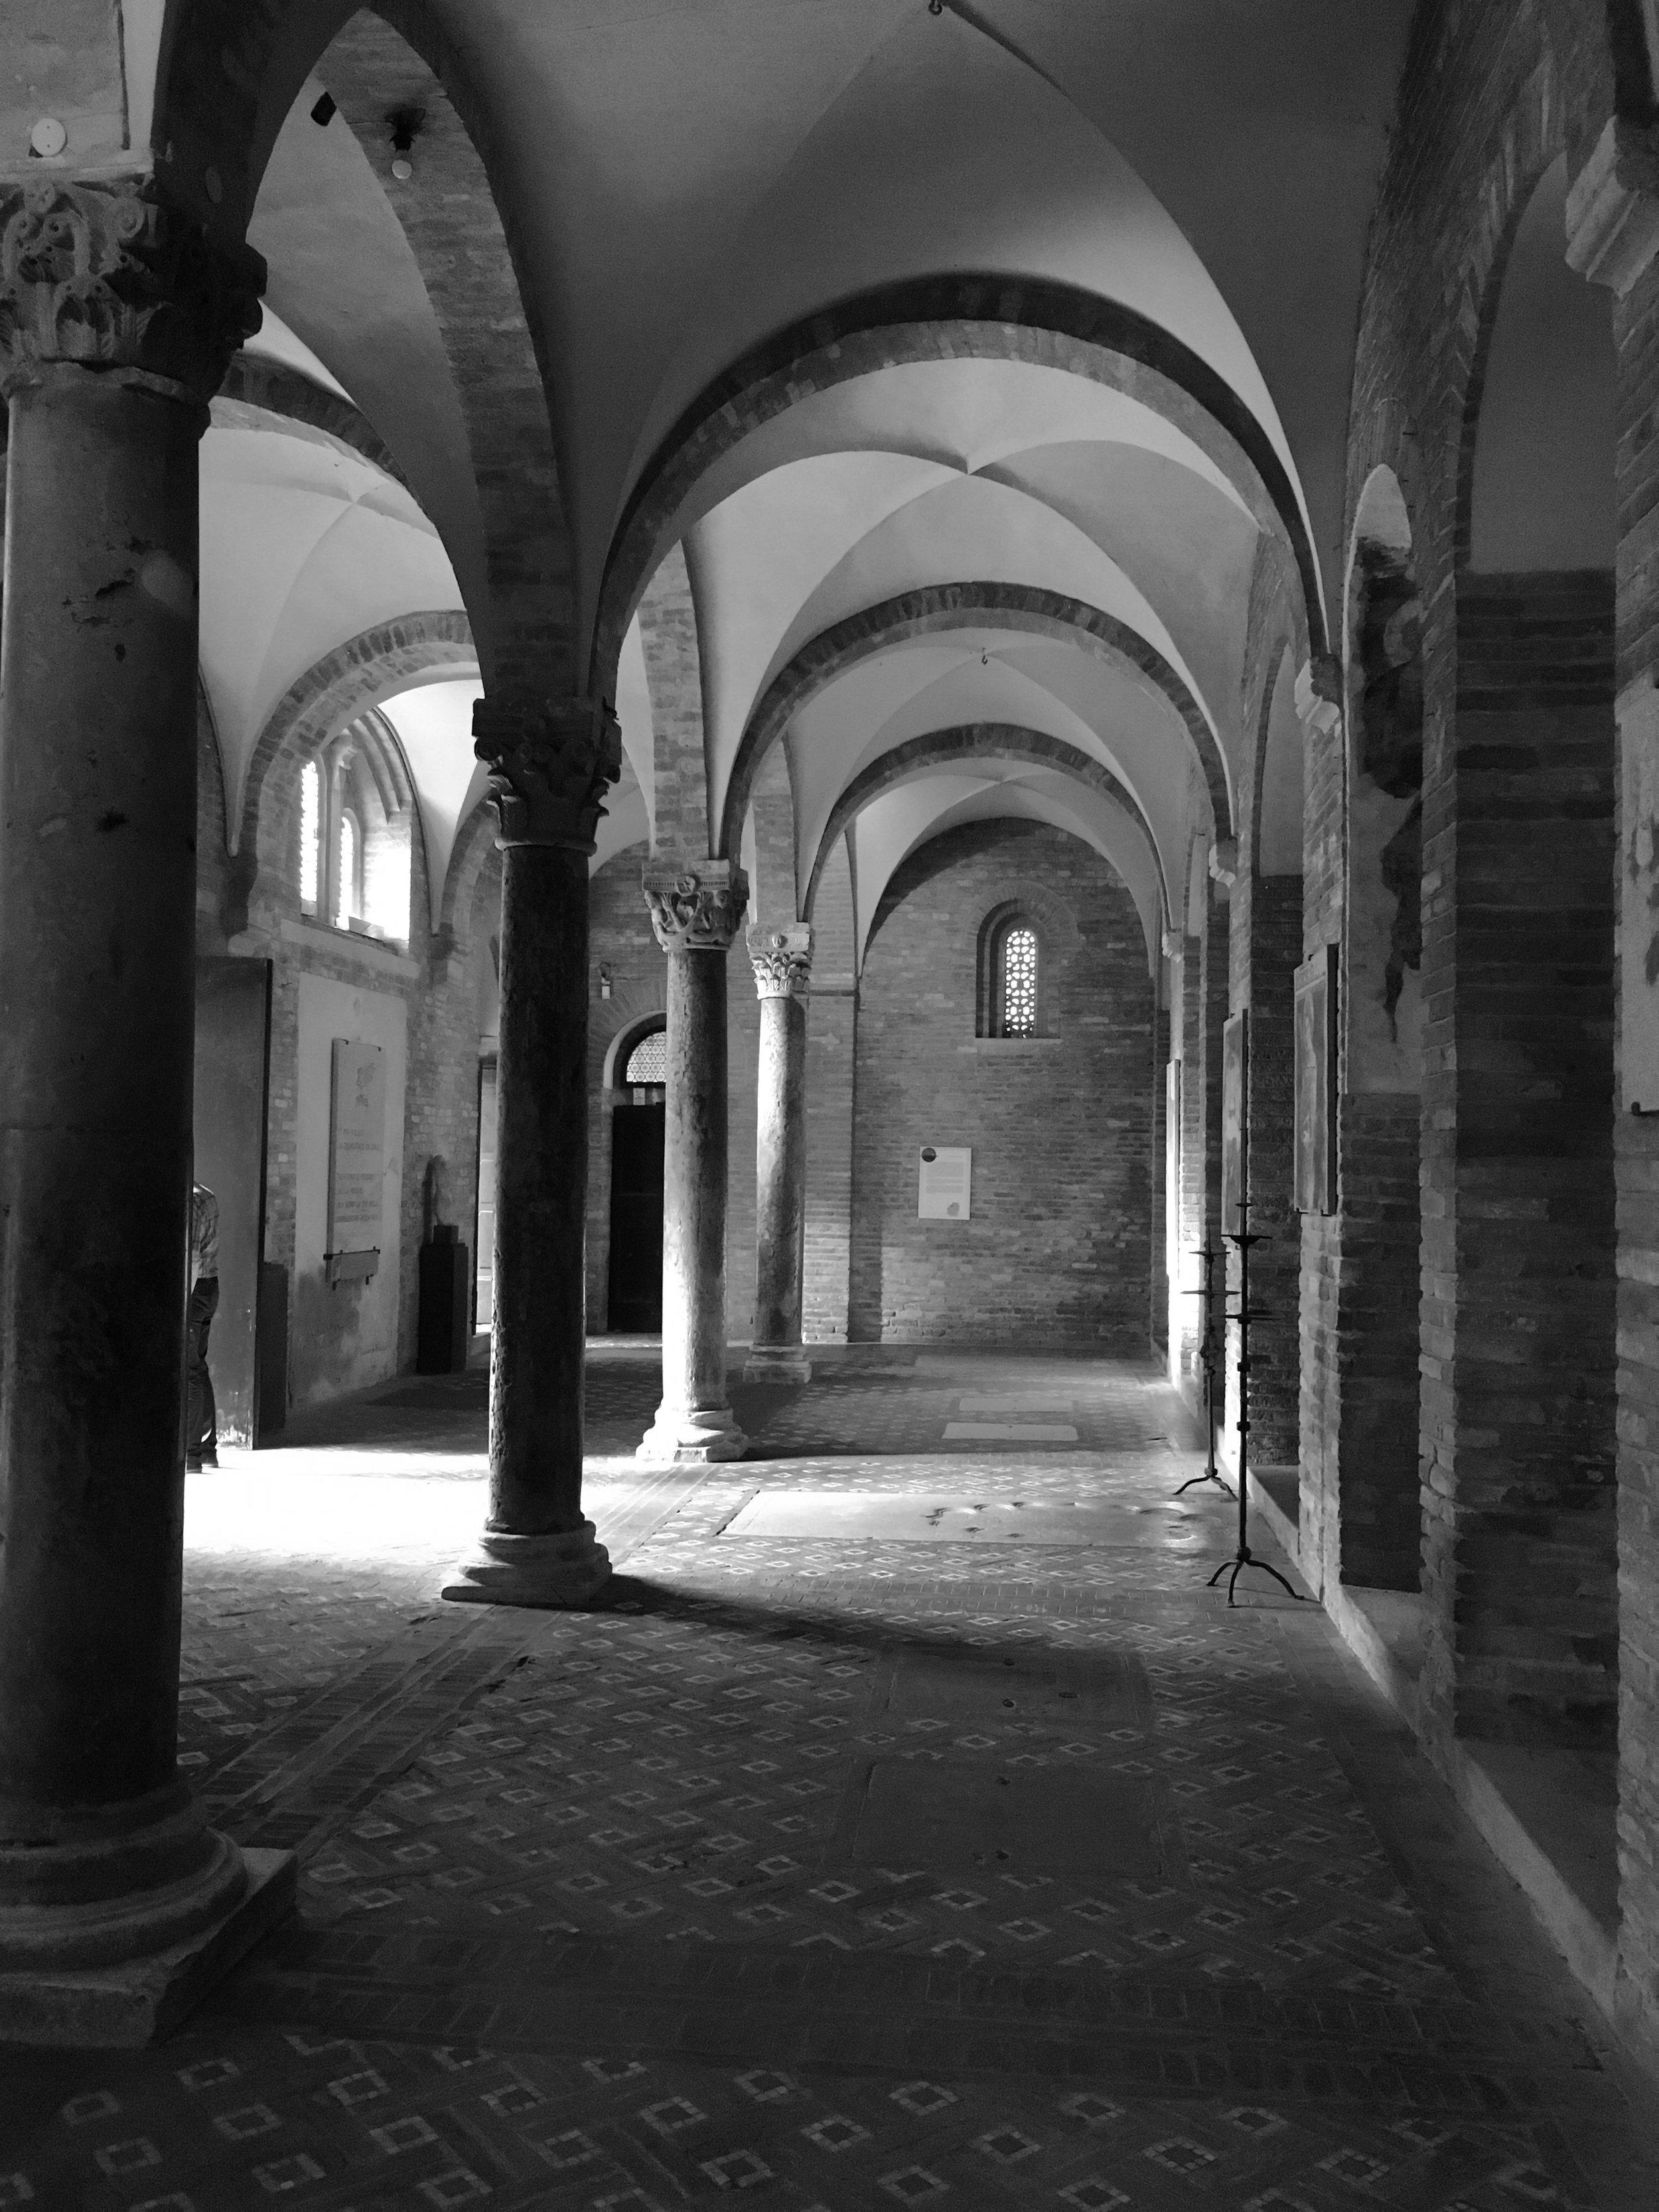 Santo Stefano in Bologna, Italy